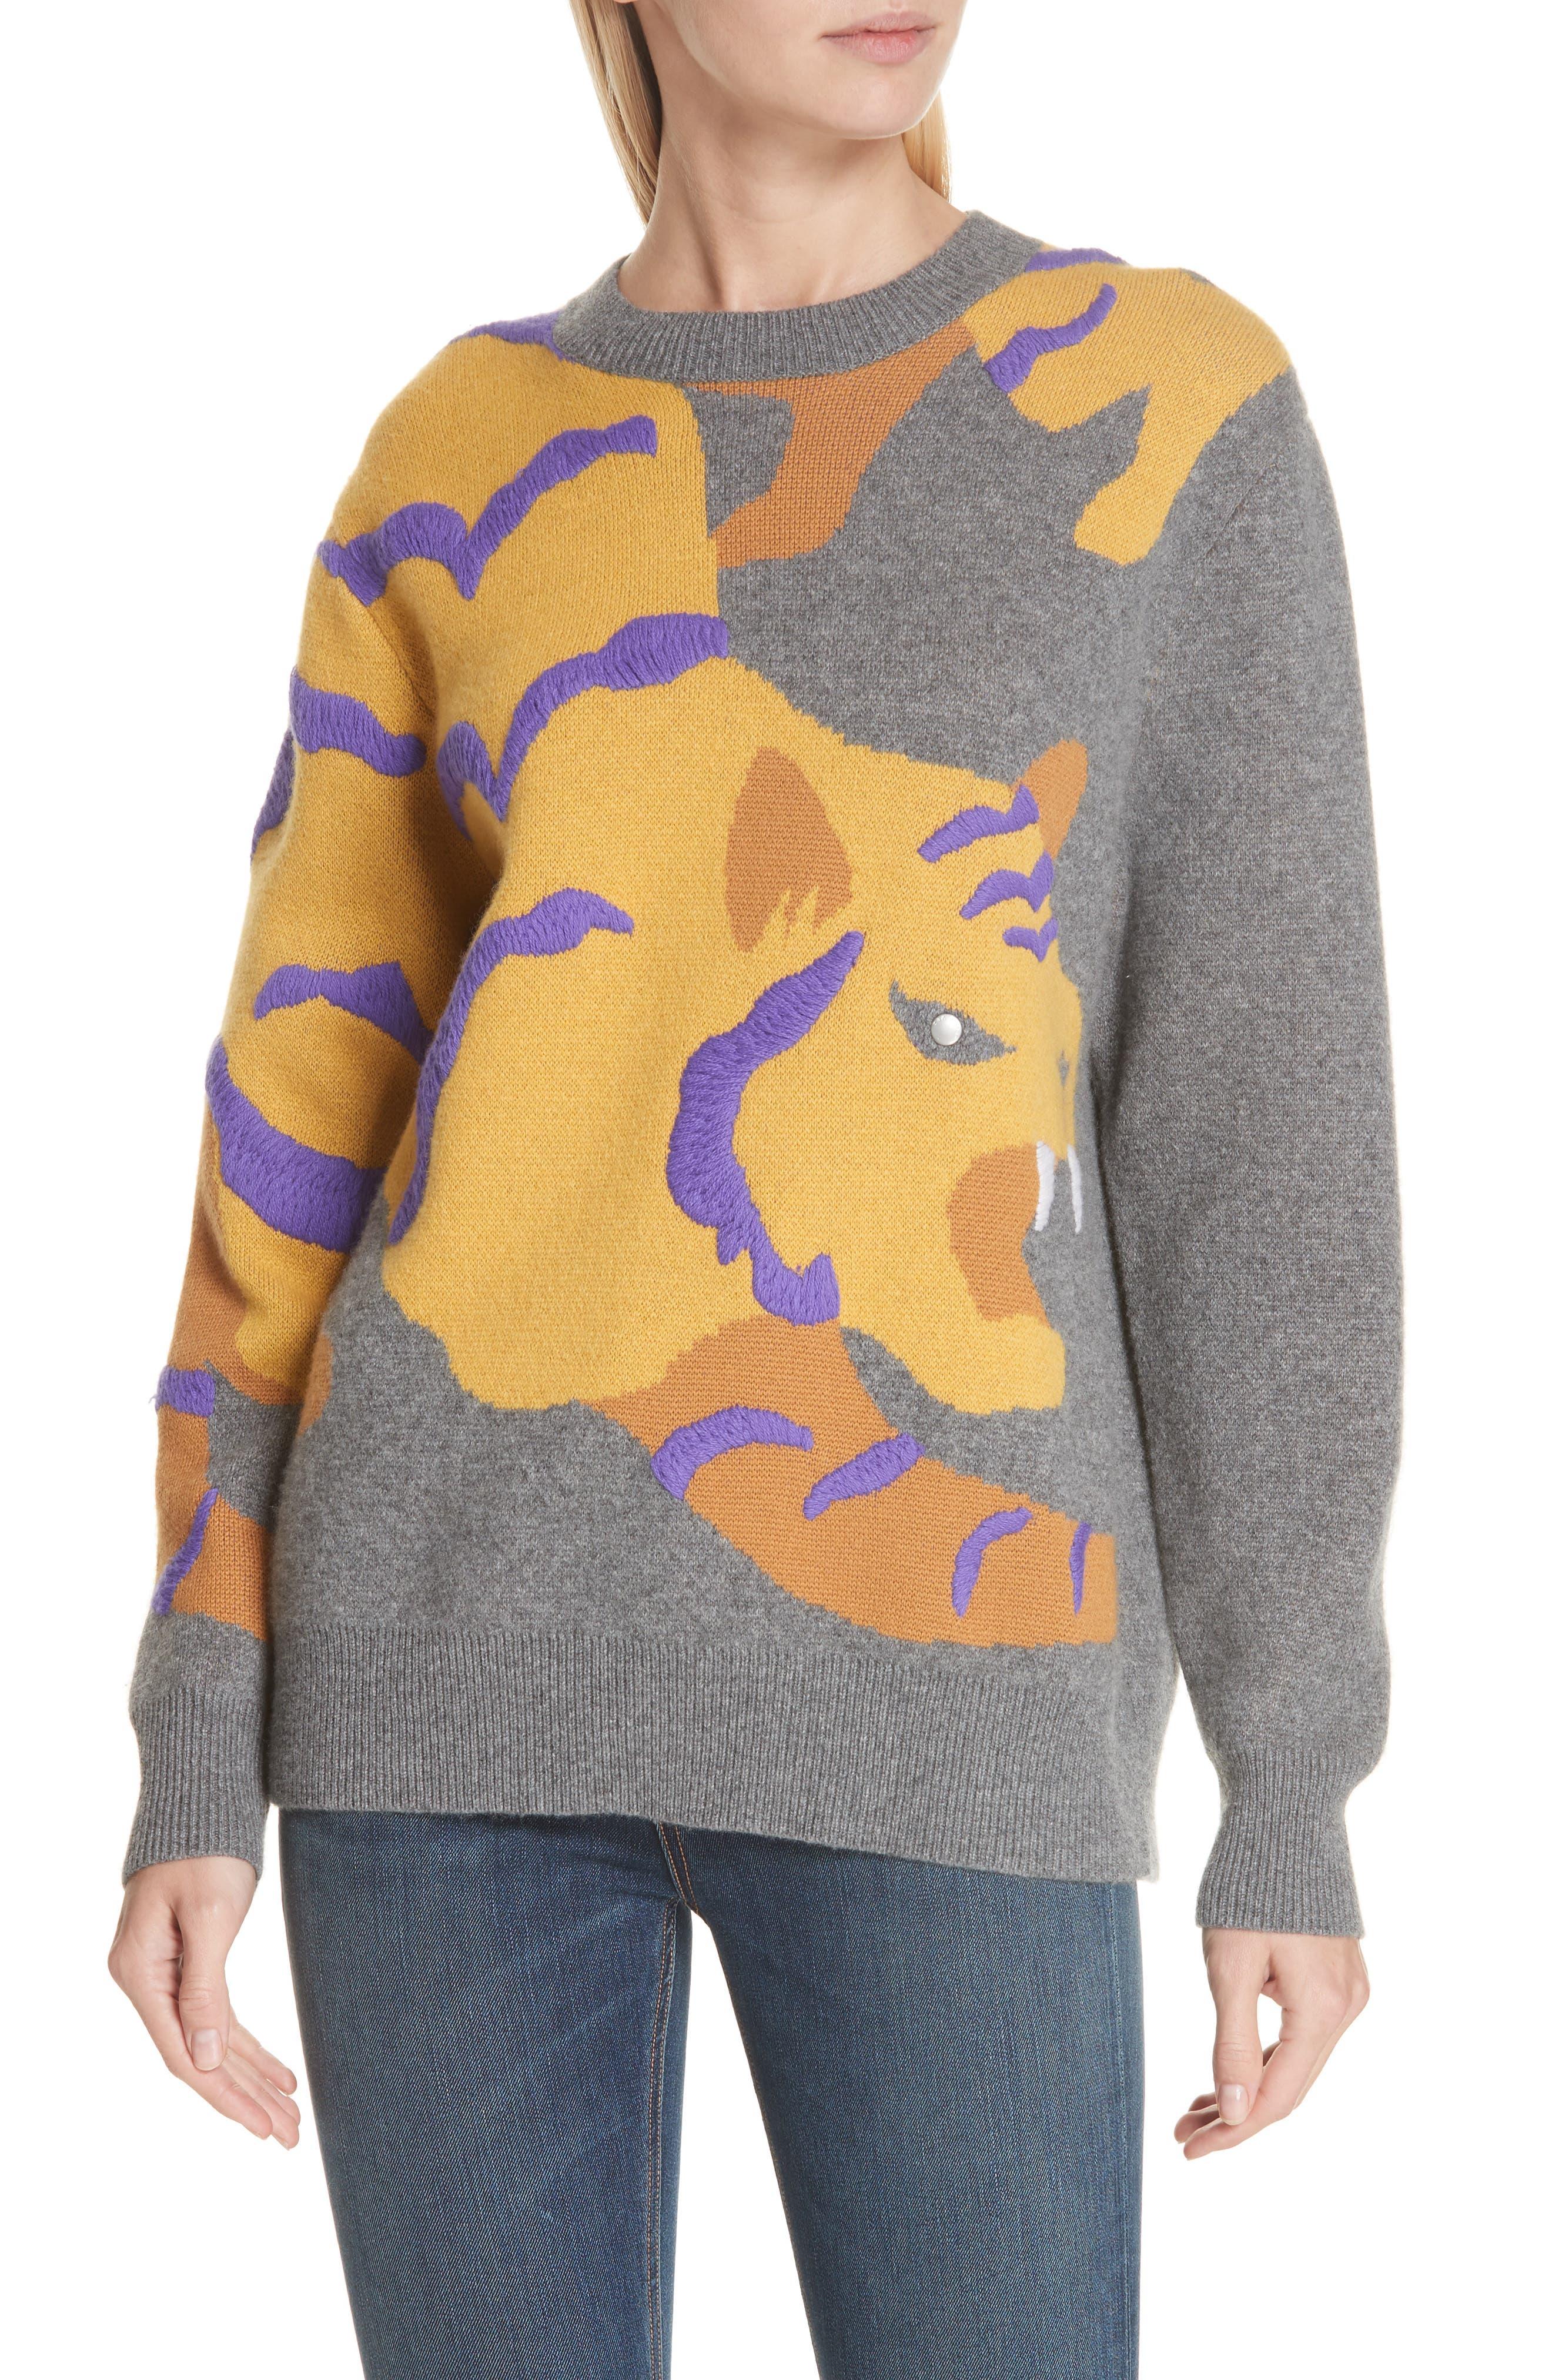 RAG & BONE,                             Tiger Cashmere Sweater,                             Main thumbnail 1, color,                             CHARCOAL